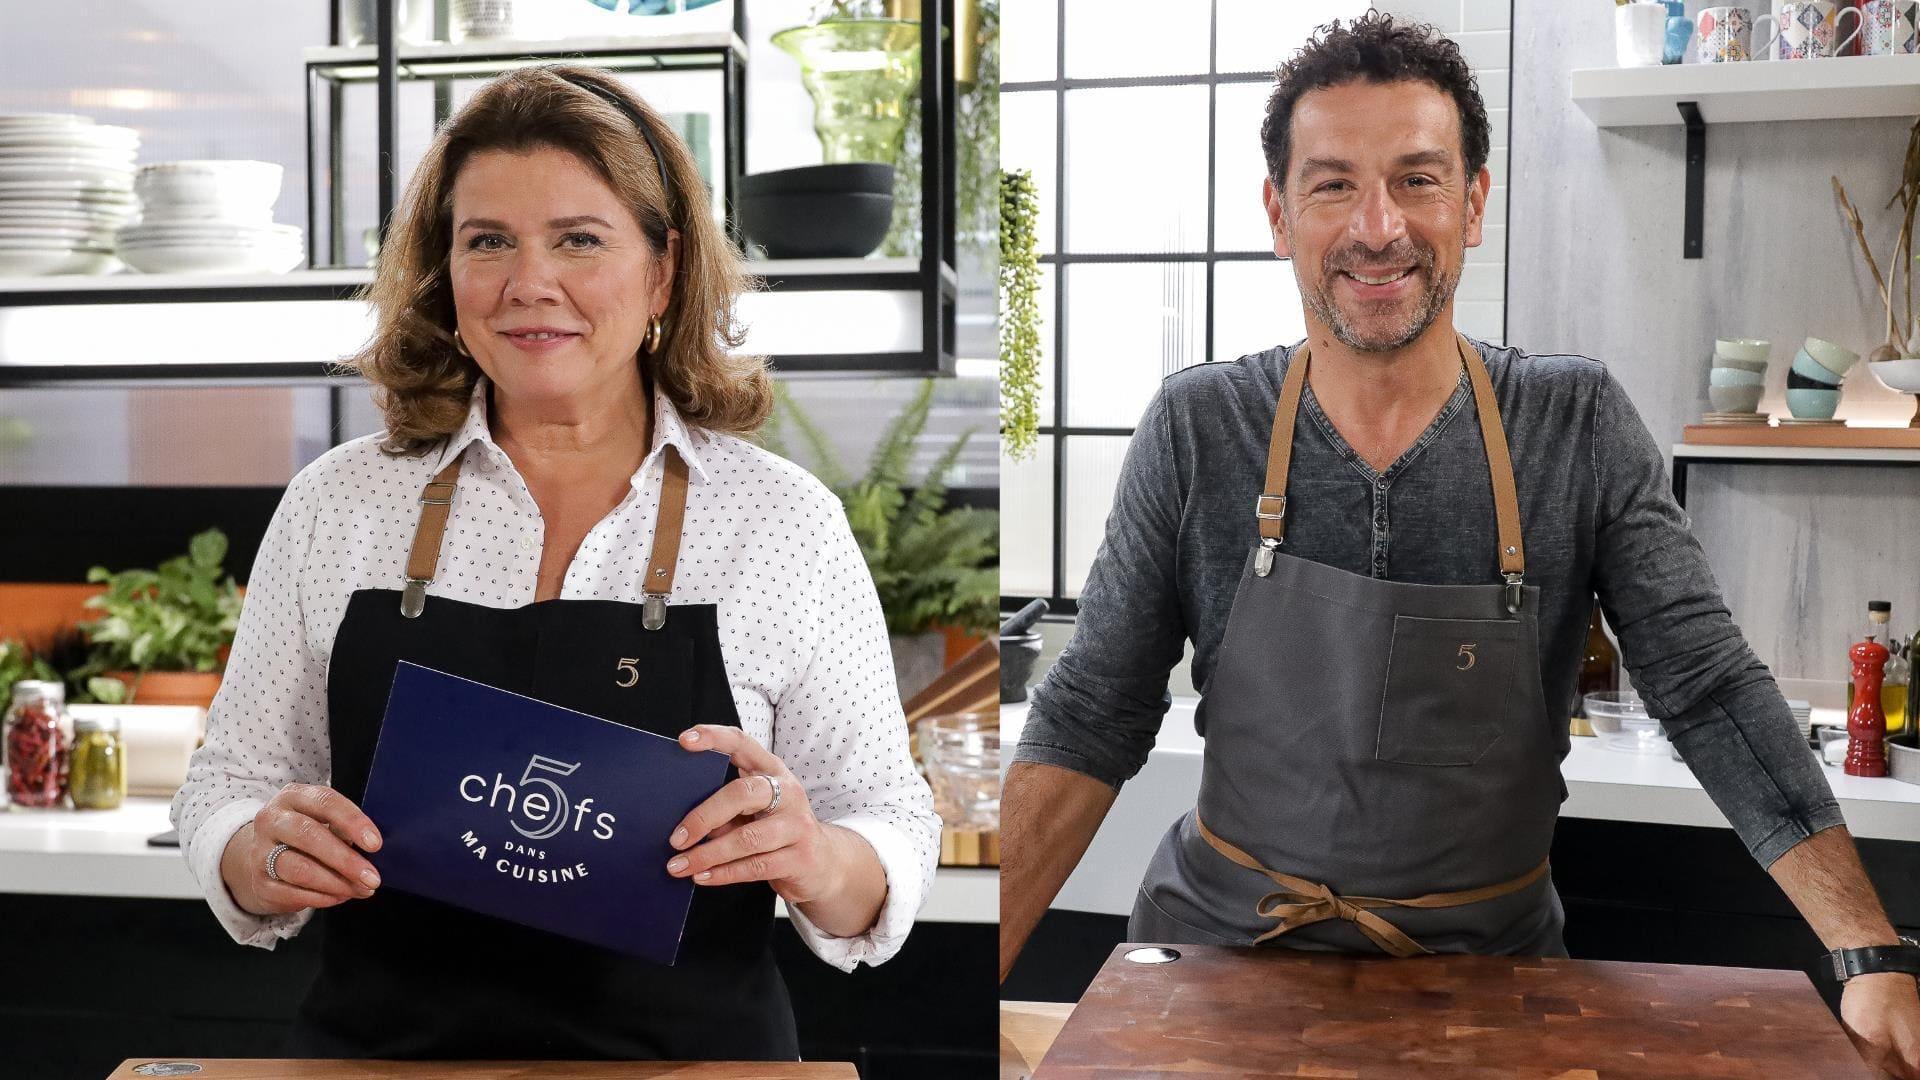 5 chefs dans ma cuisine Season 1 :Episode 24  Episode 24